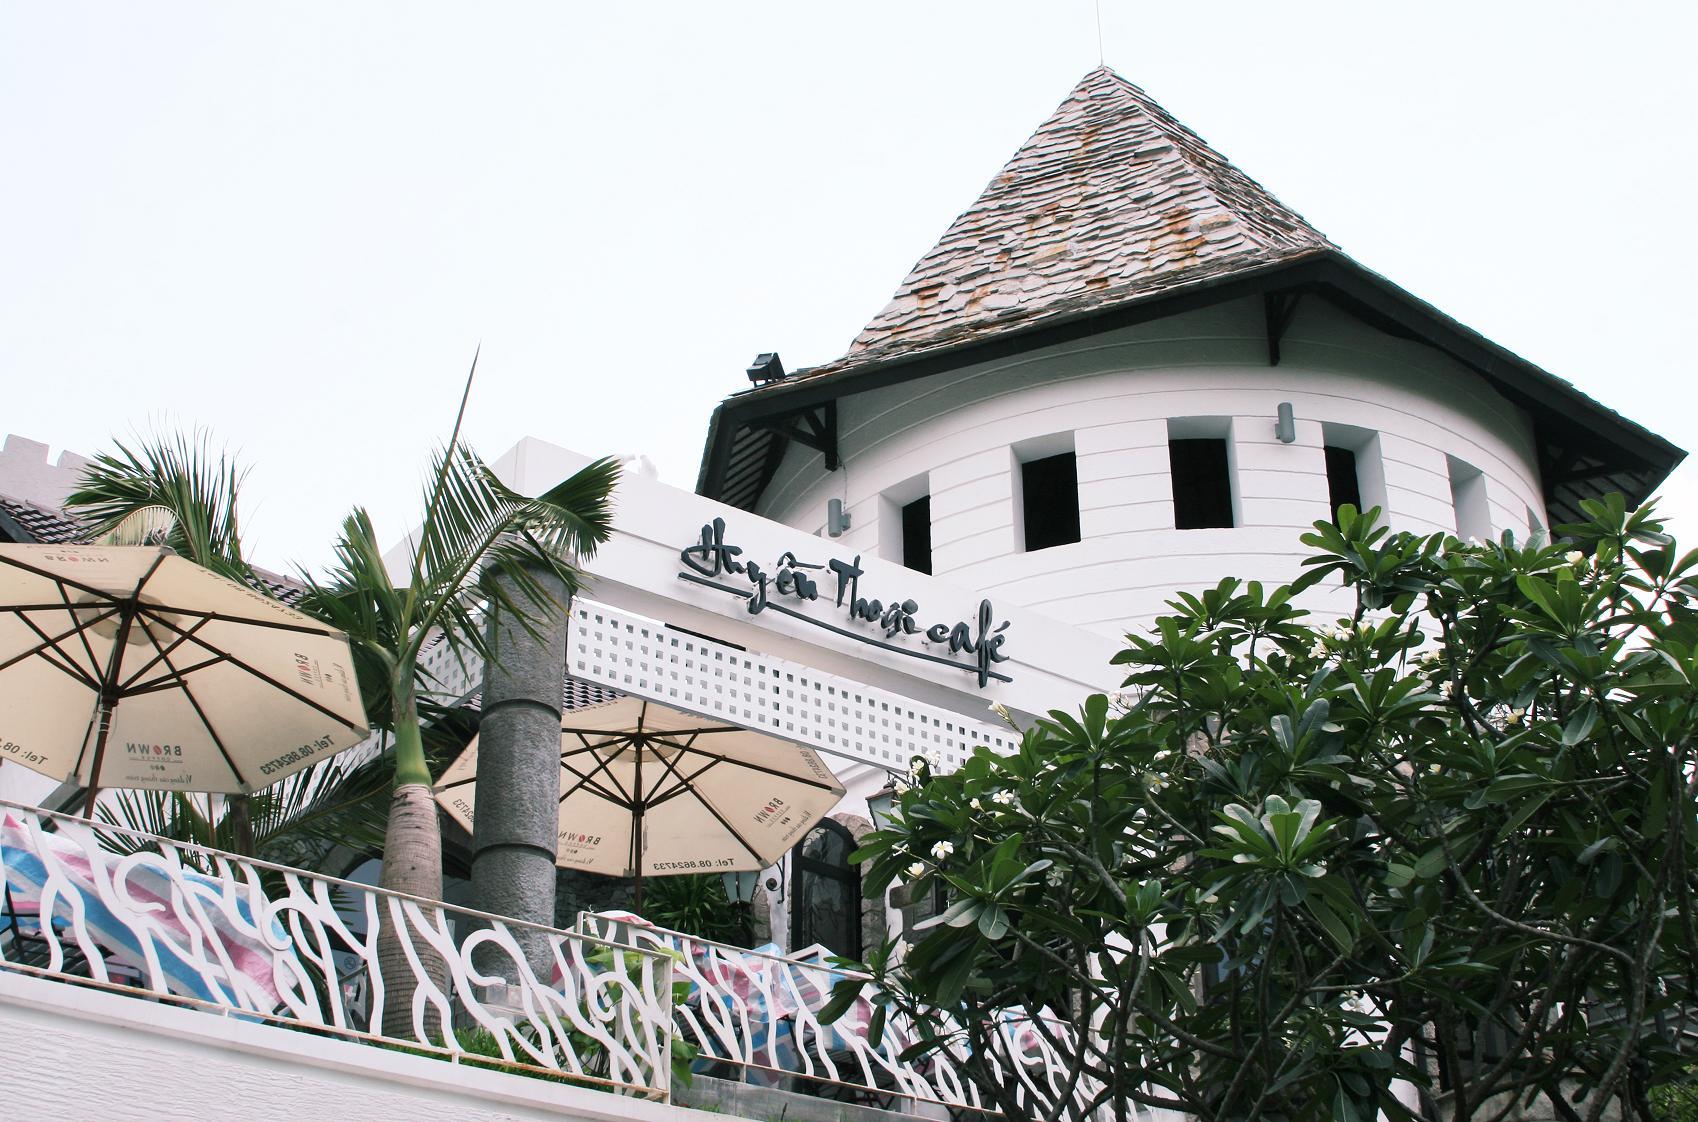 Cafe Huyền Thoại.